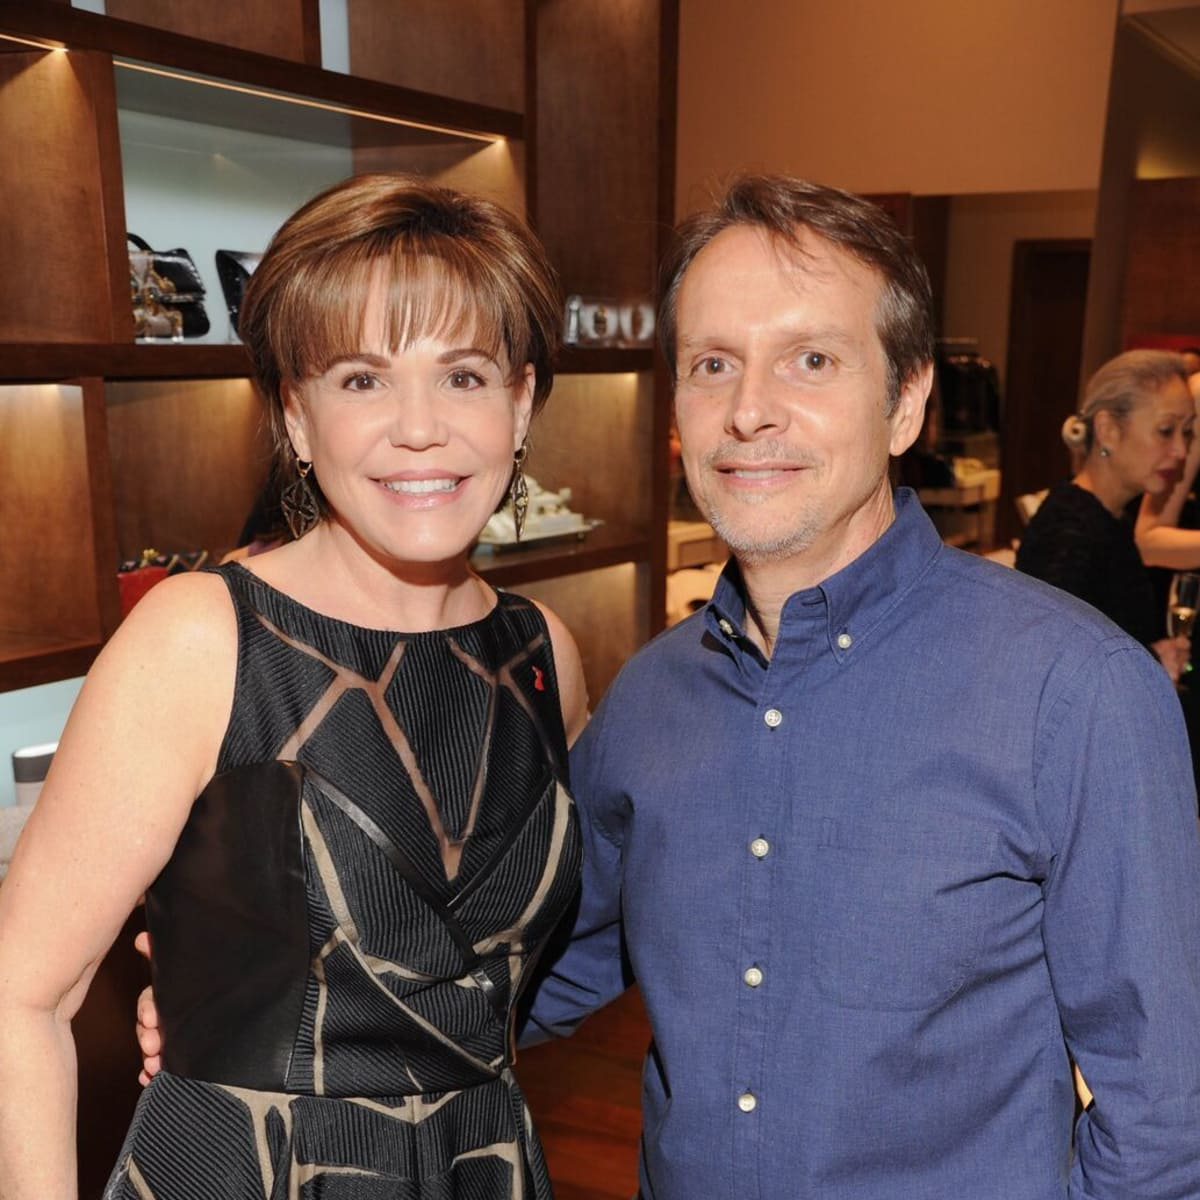 Hallie Vanderhider and Liancarlo designer Carlos Ramirez at American Heart Association show at Elizabeth Anthony